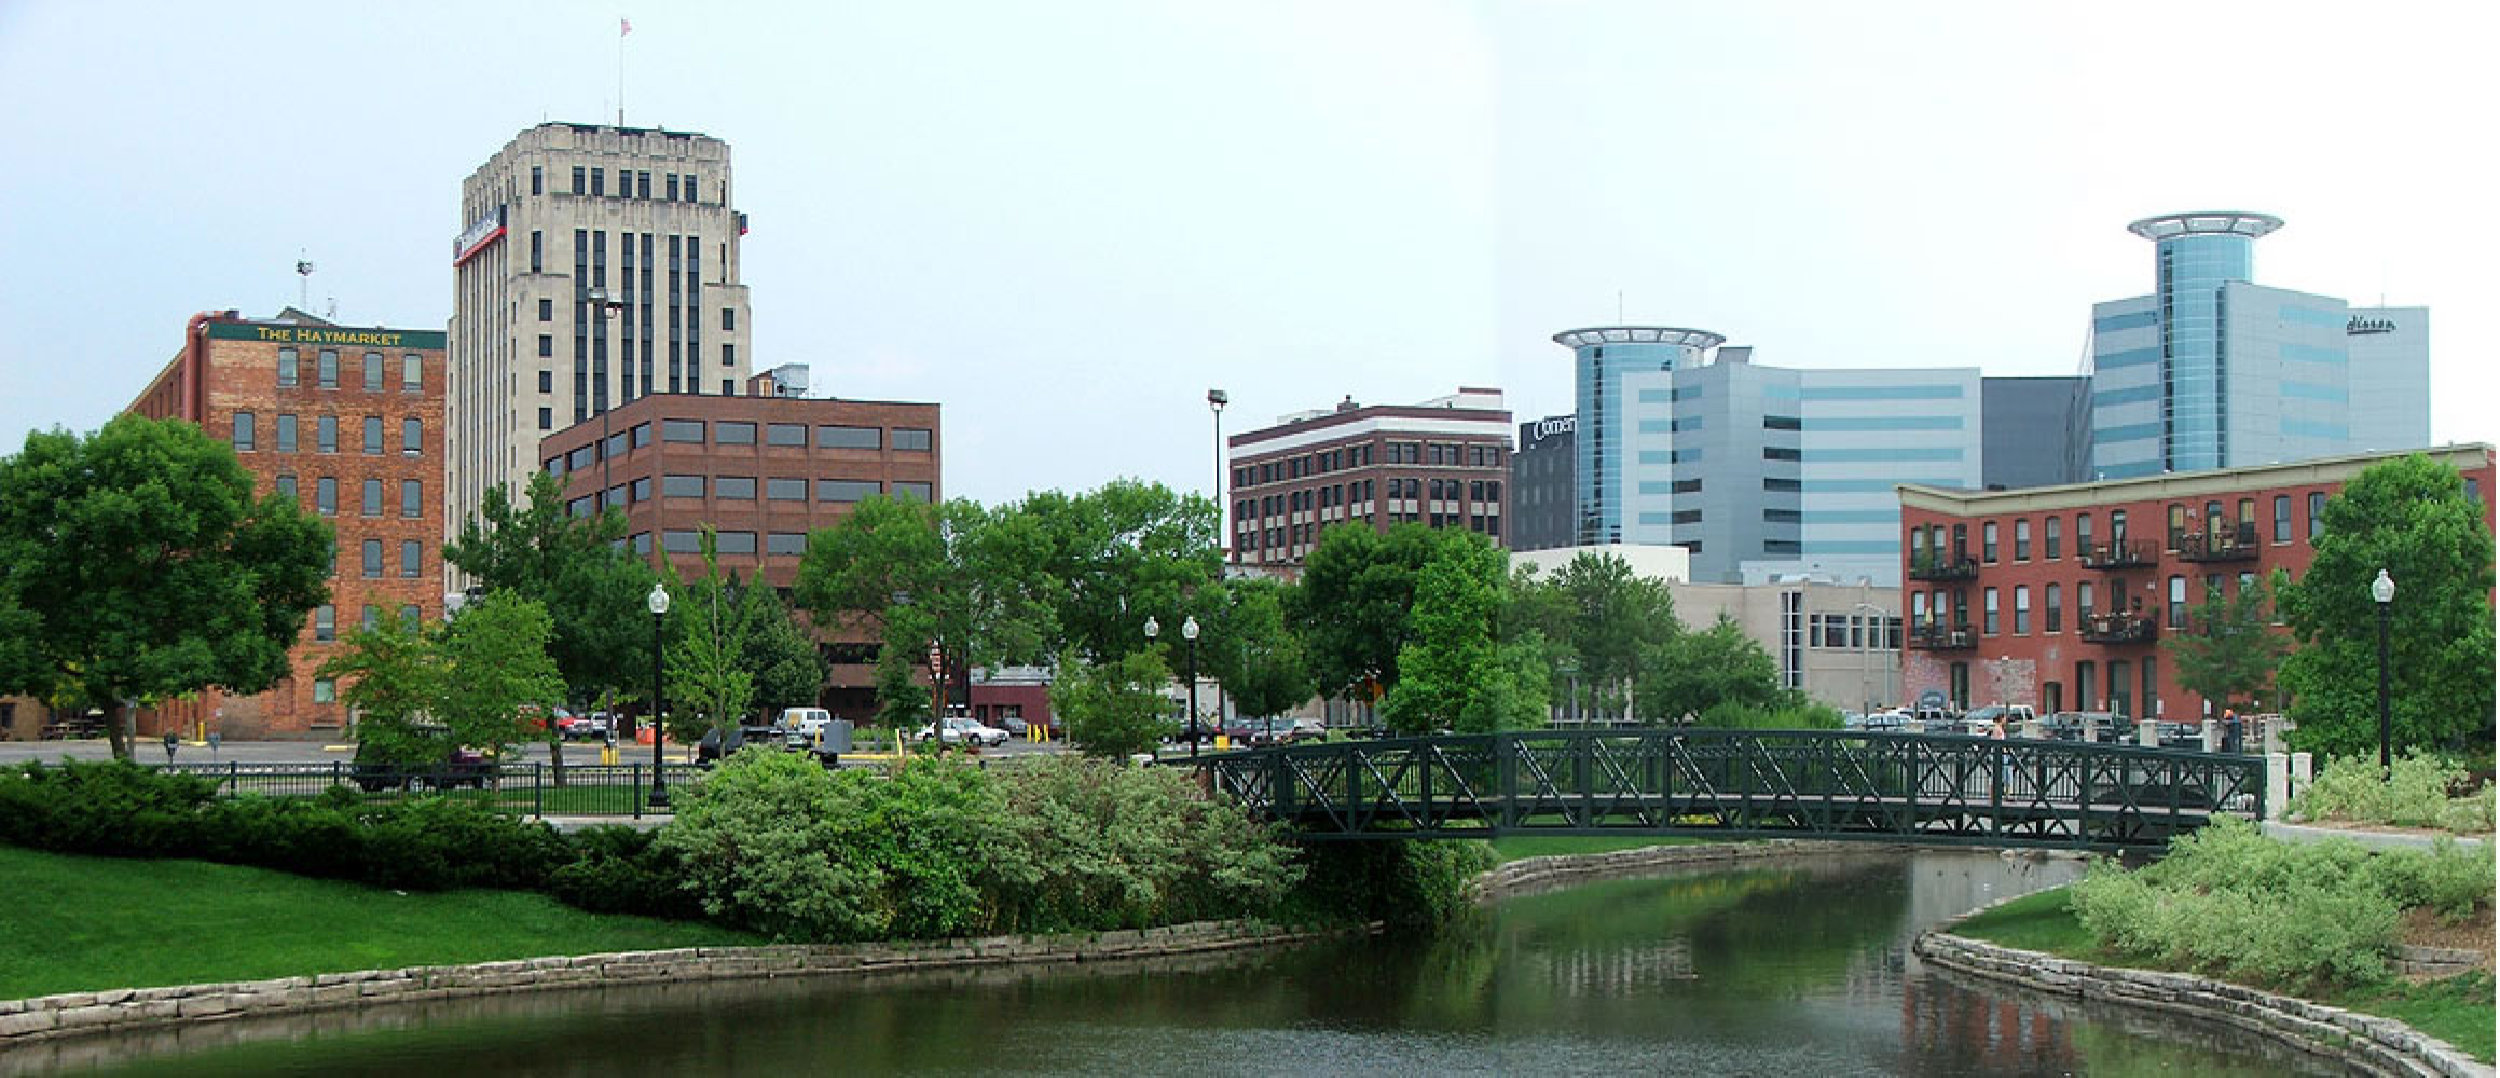 Kalamazoo, Michigan (Mxobe/Wikimedia Commons, Creative Commons)